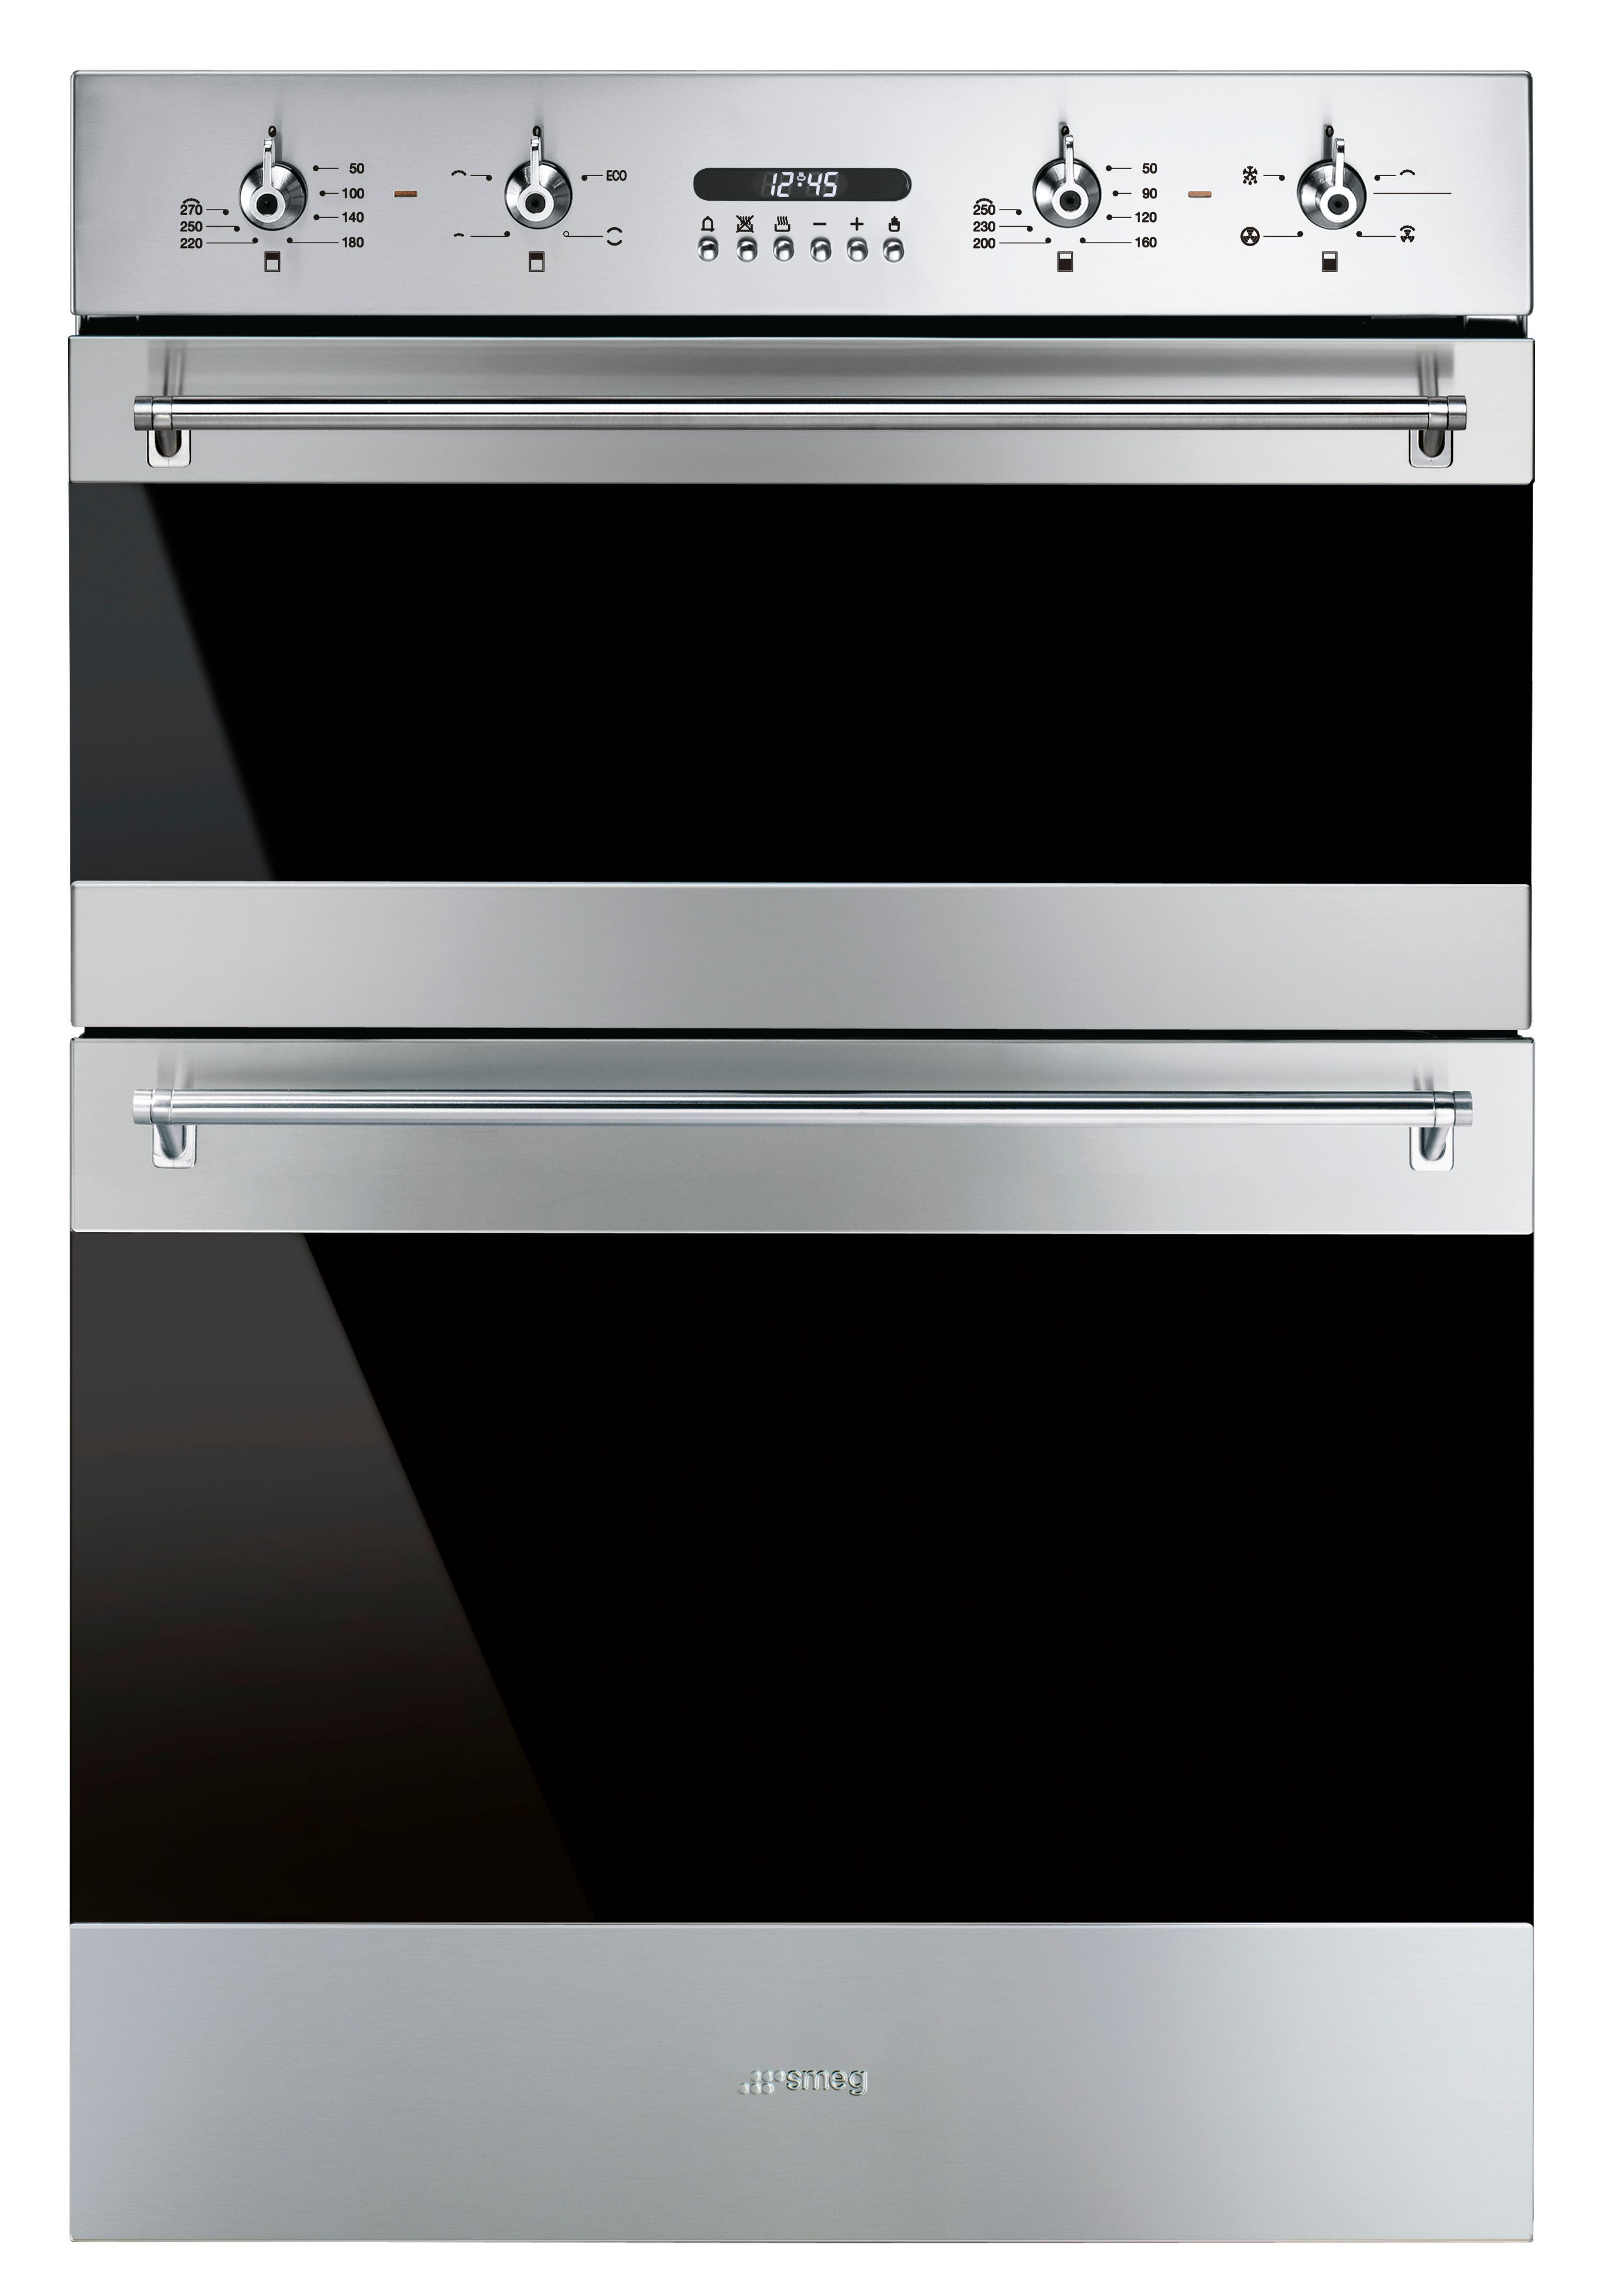 hight resolution of smeg double oven wiring diagram oven stainless rh pinterest com design